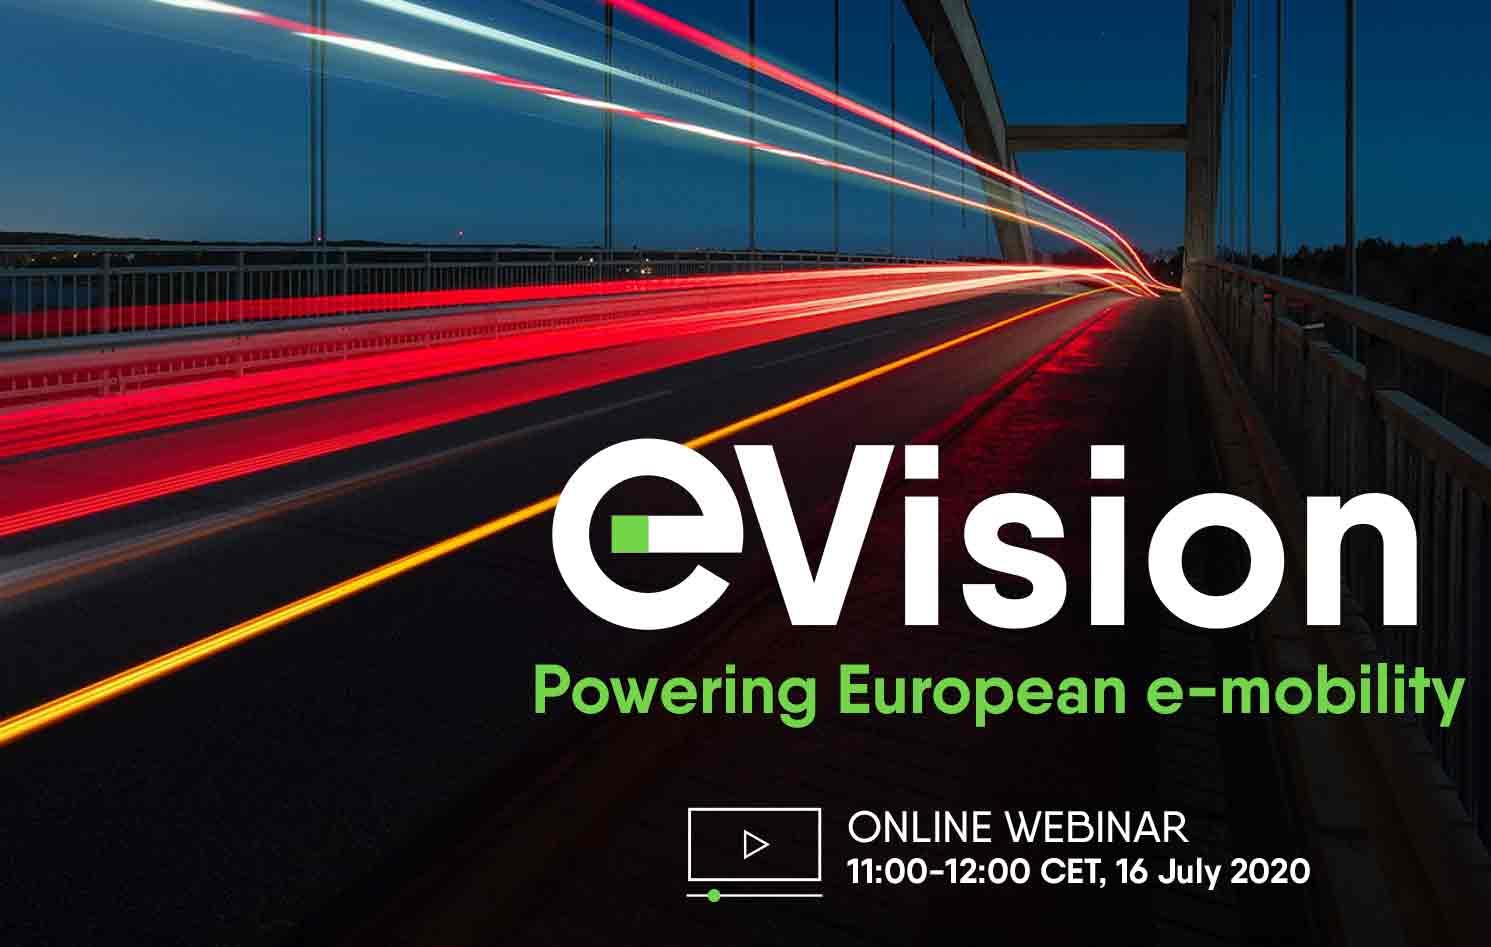 Evision Webinar Website Event